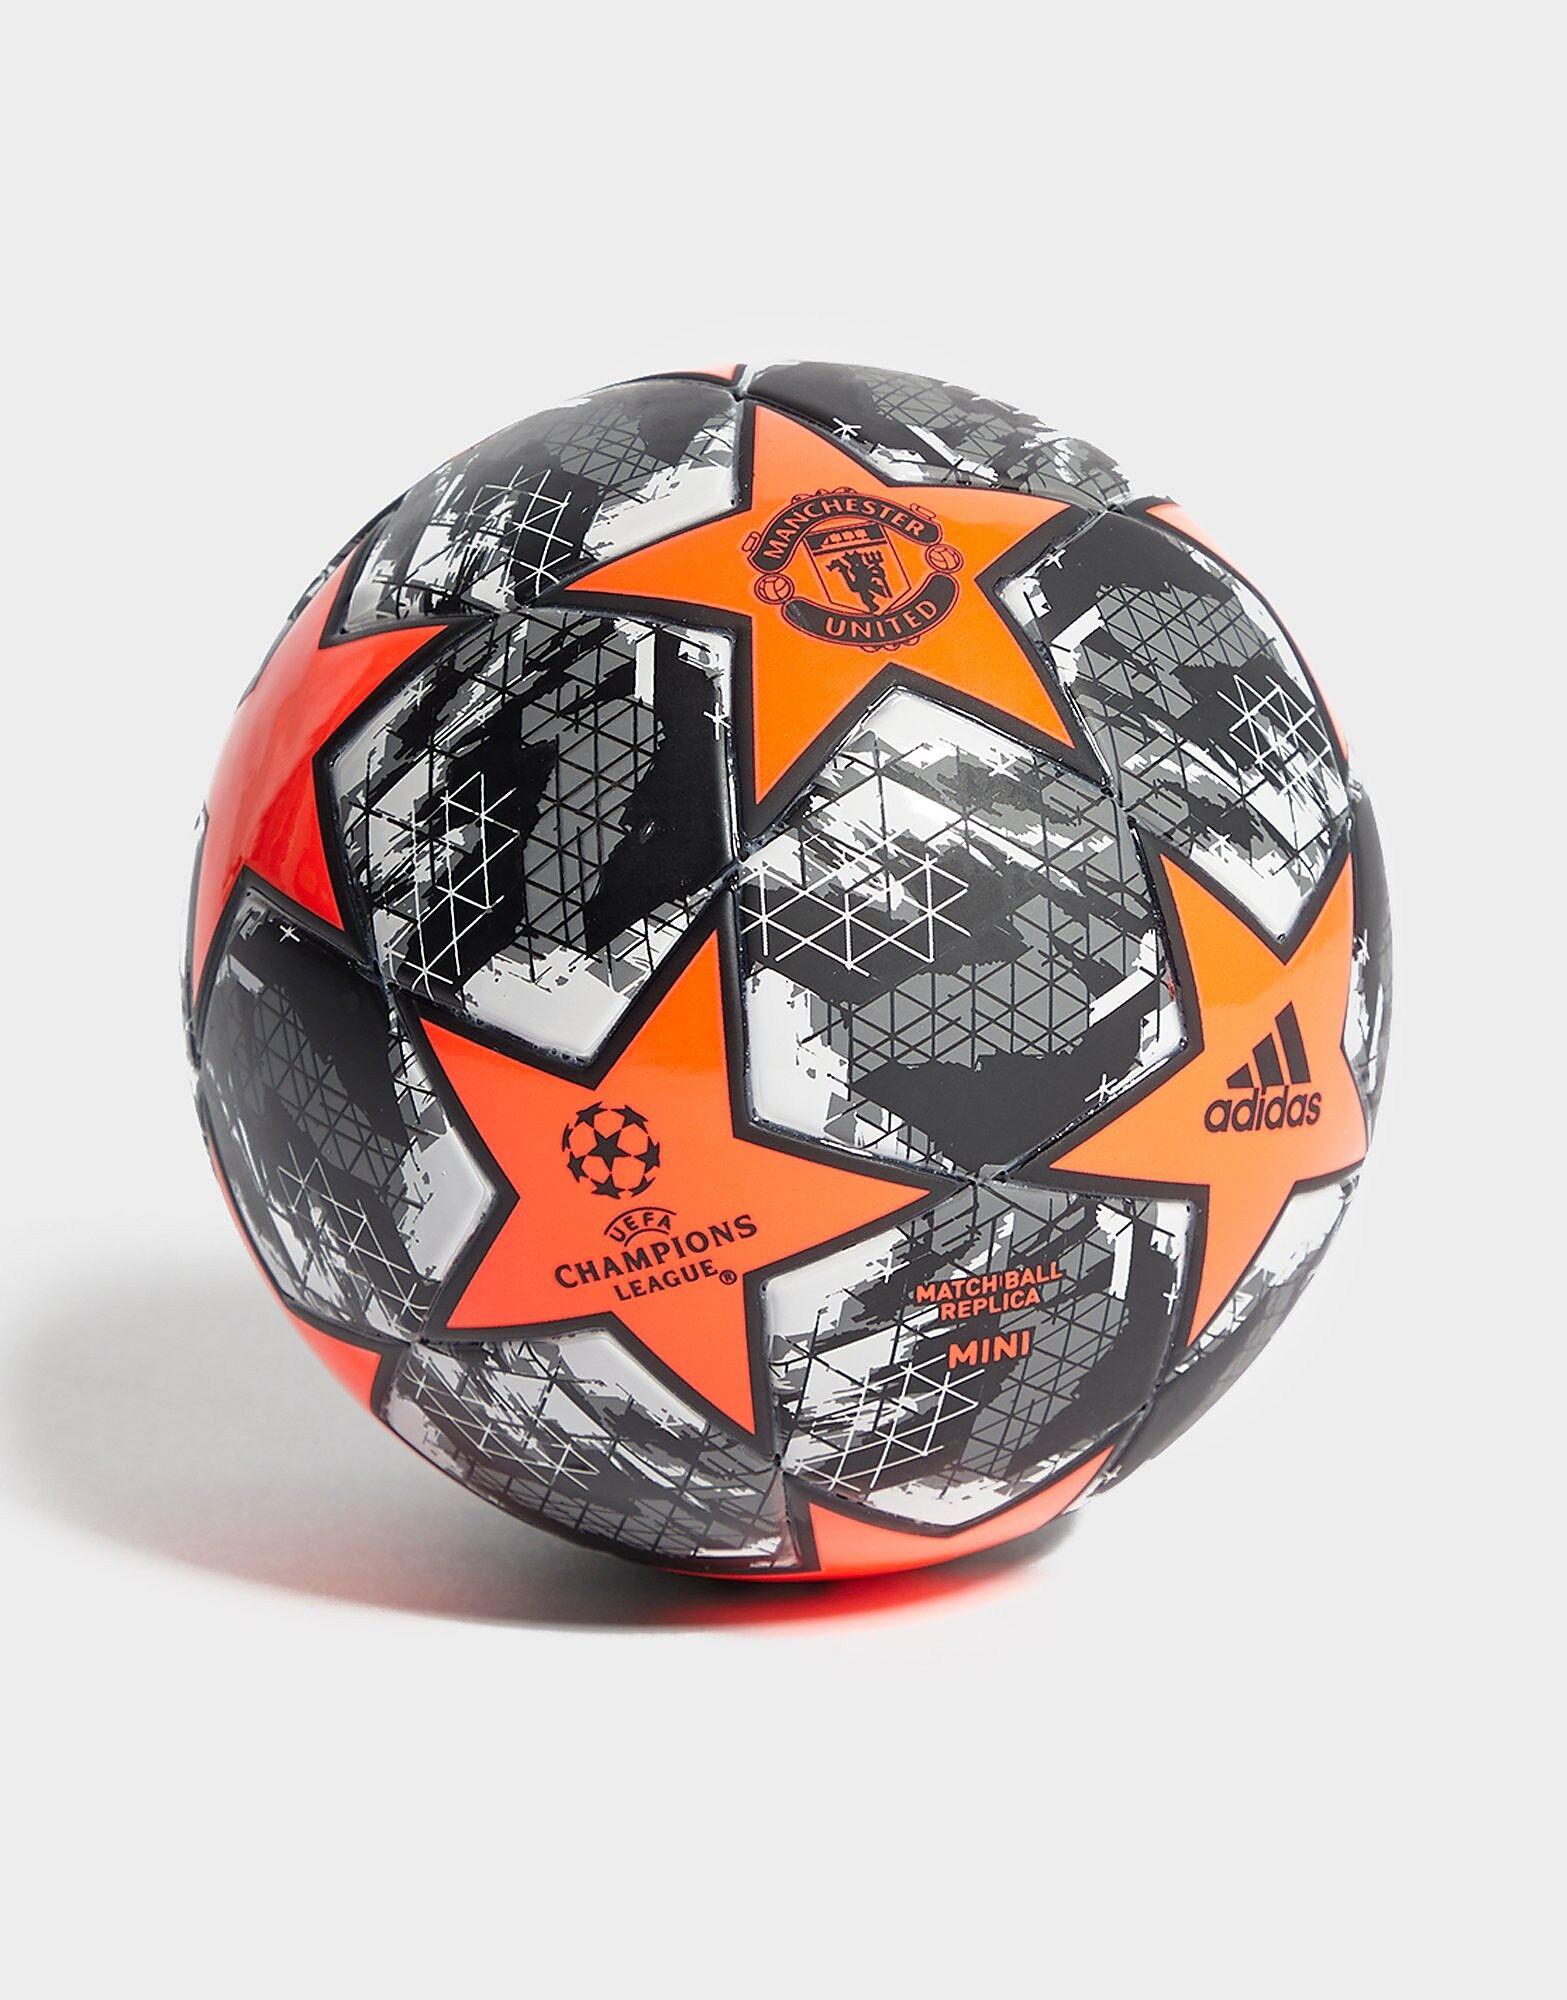 Image of Adidas Manchester United FC 2019 Minijalkapallo - Mens, Musta